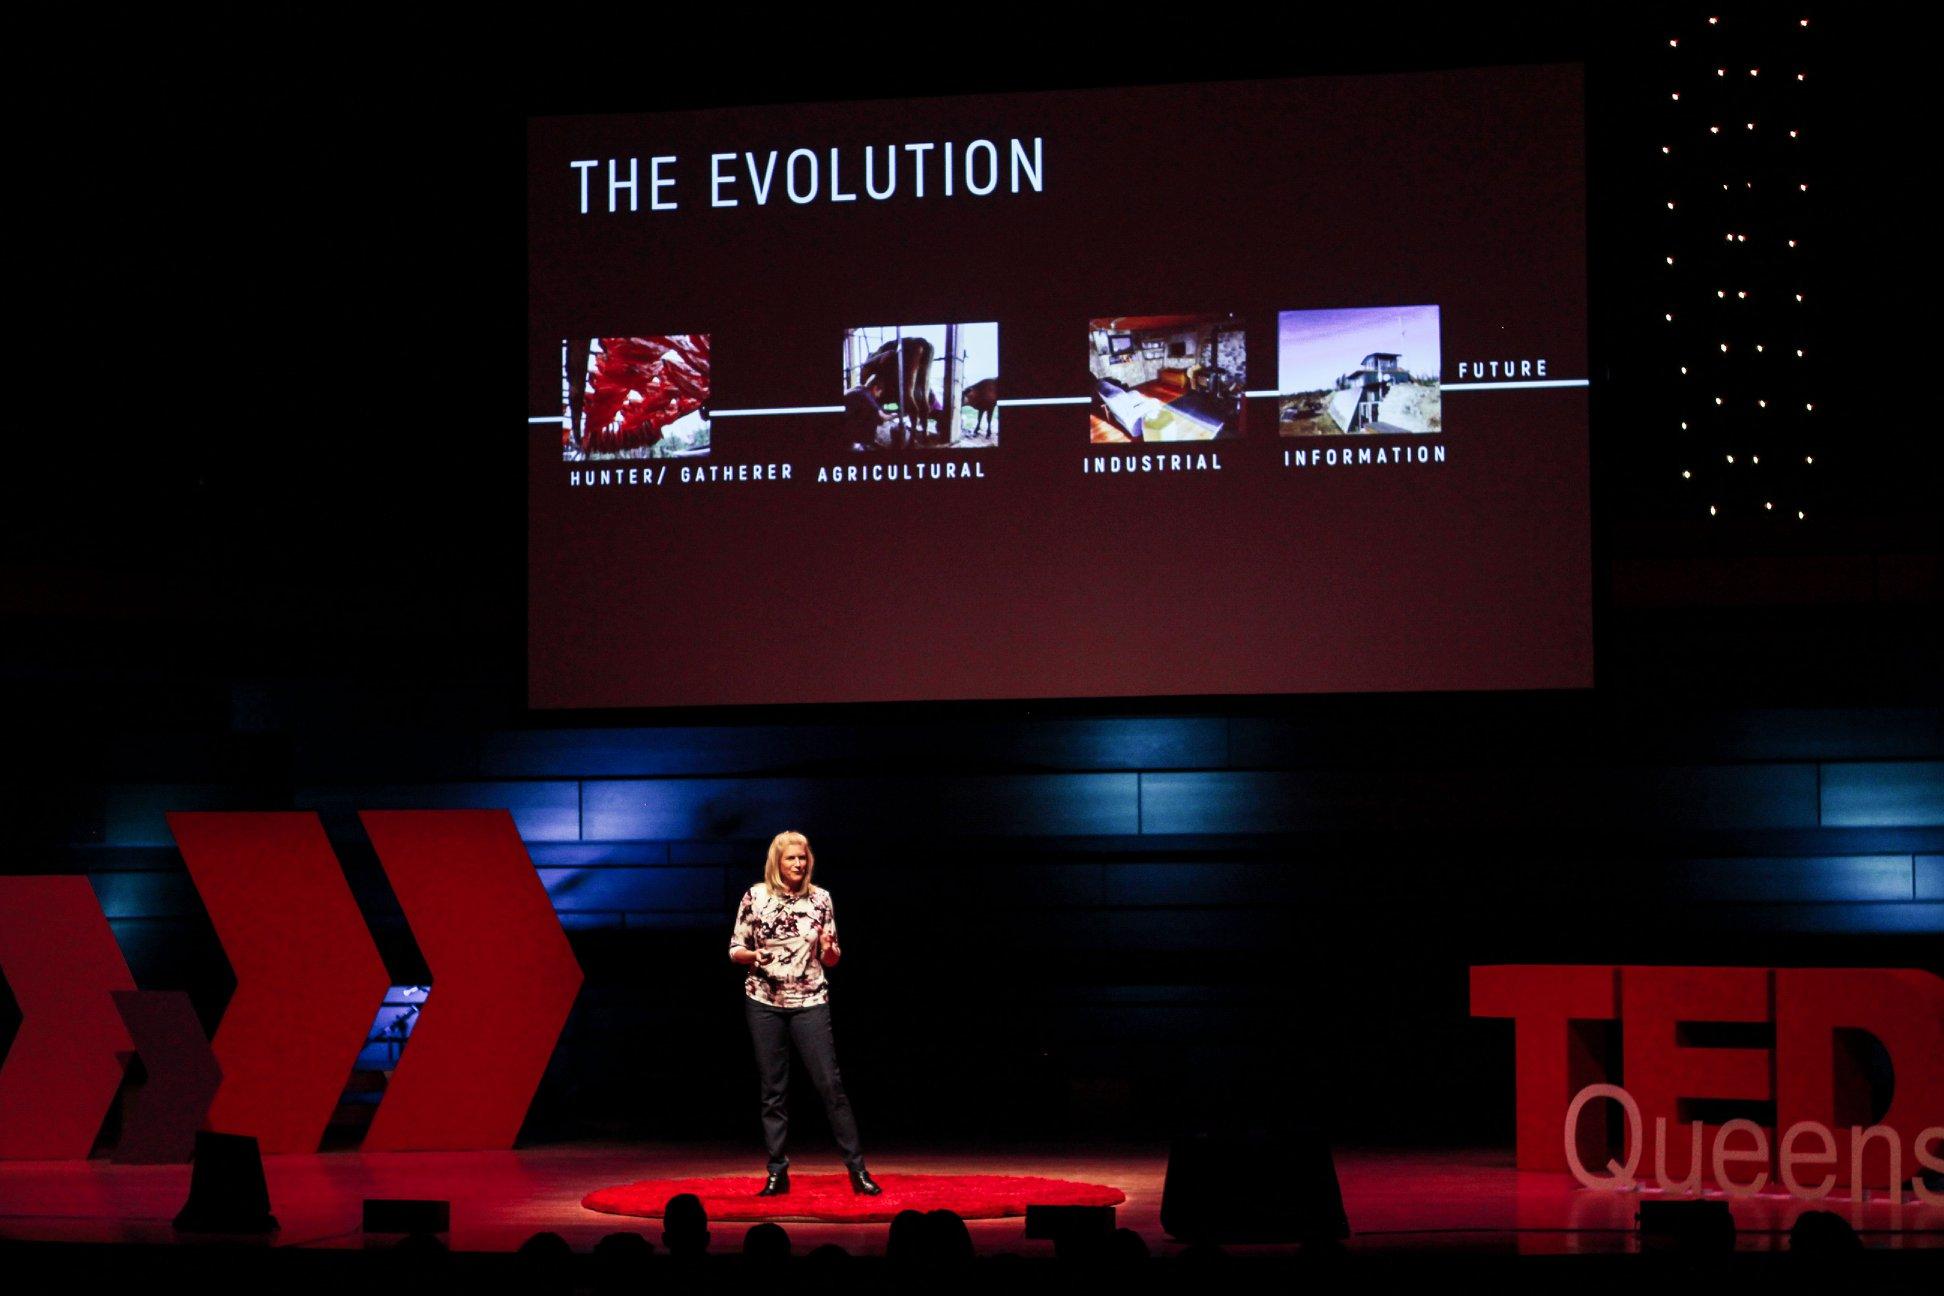 Photo Courtesy of TEDx Queensu